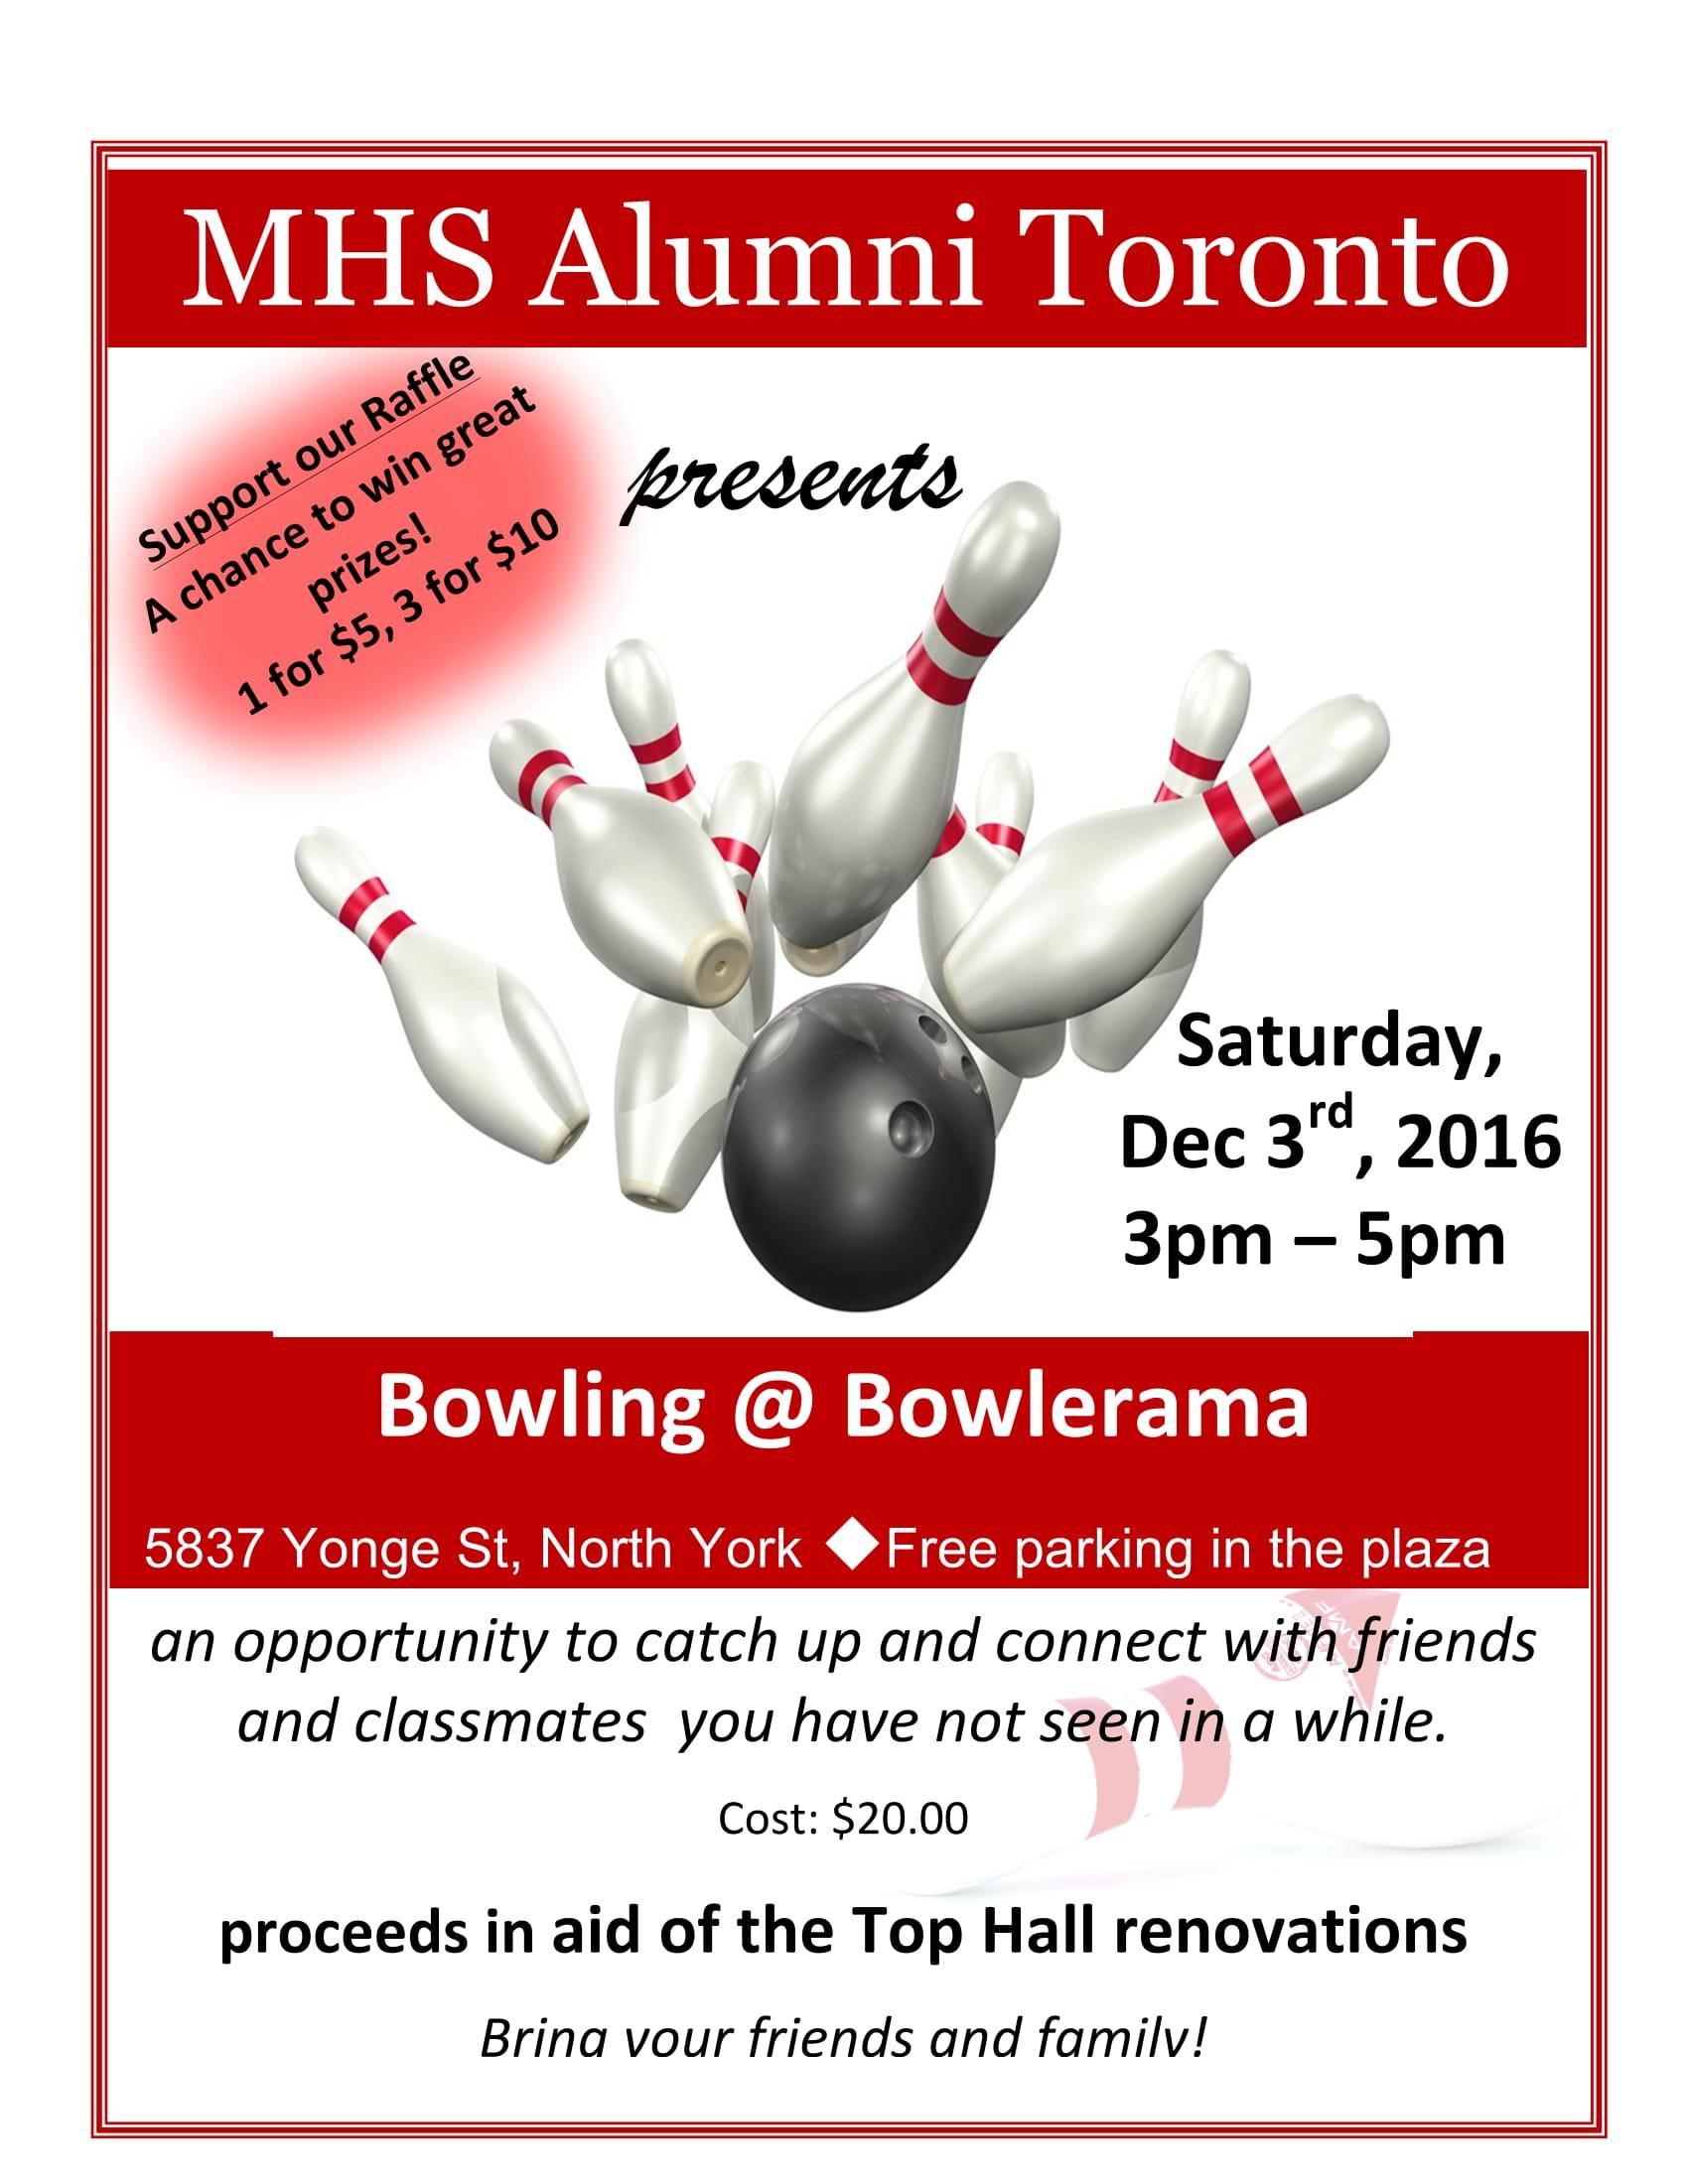 Manchester High School Alumni - Toronto